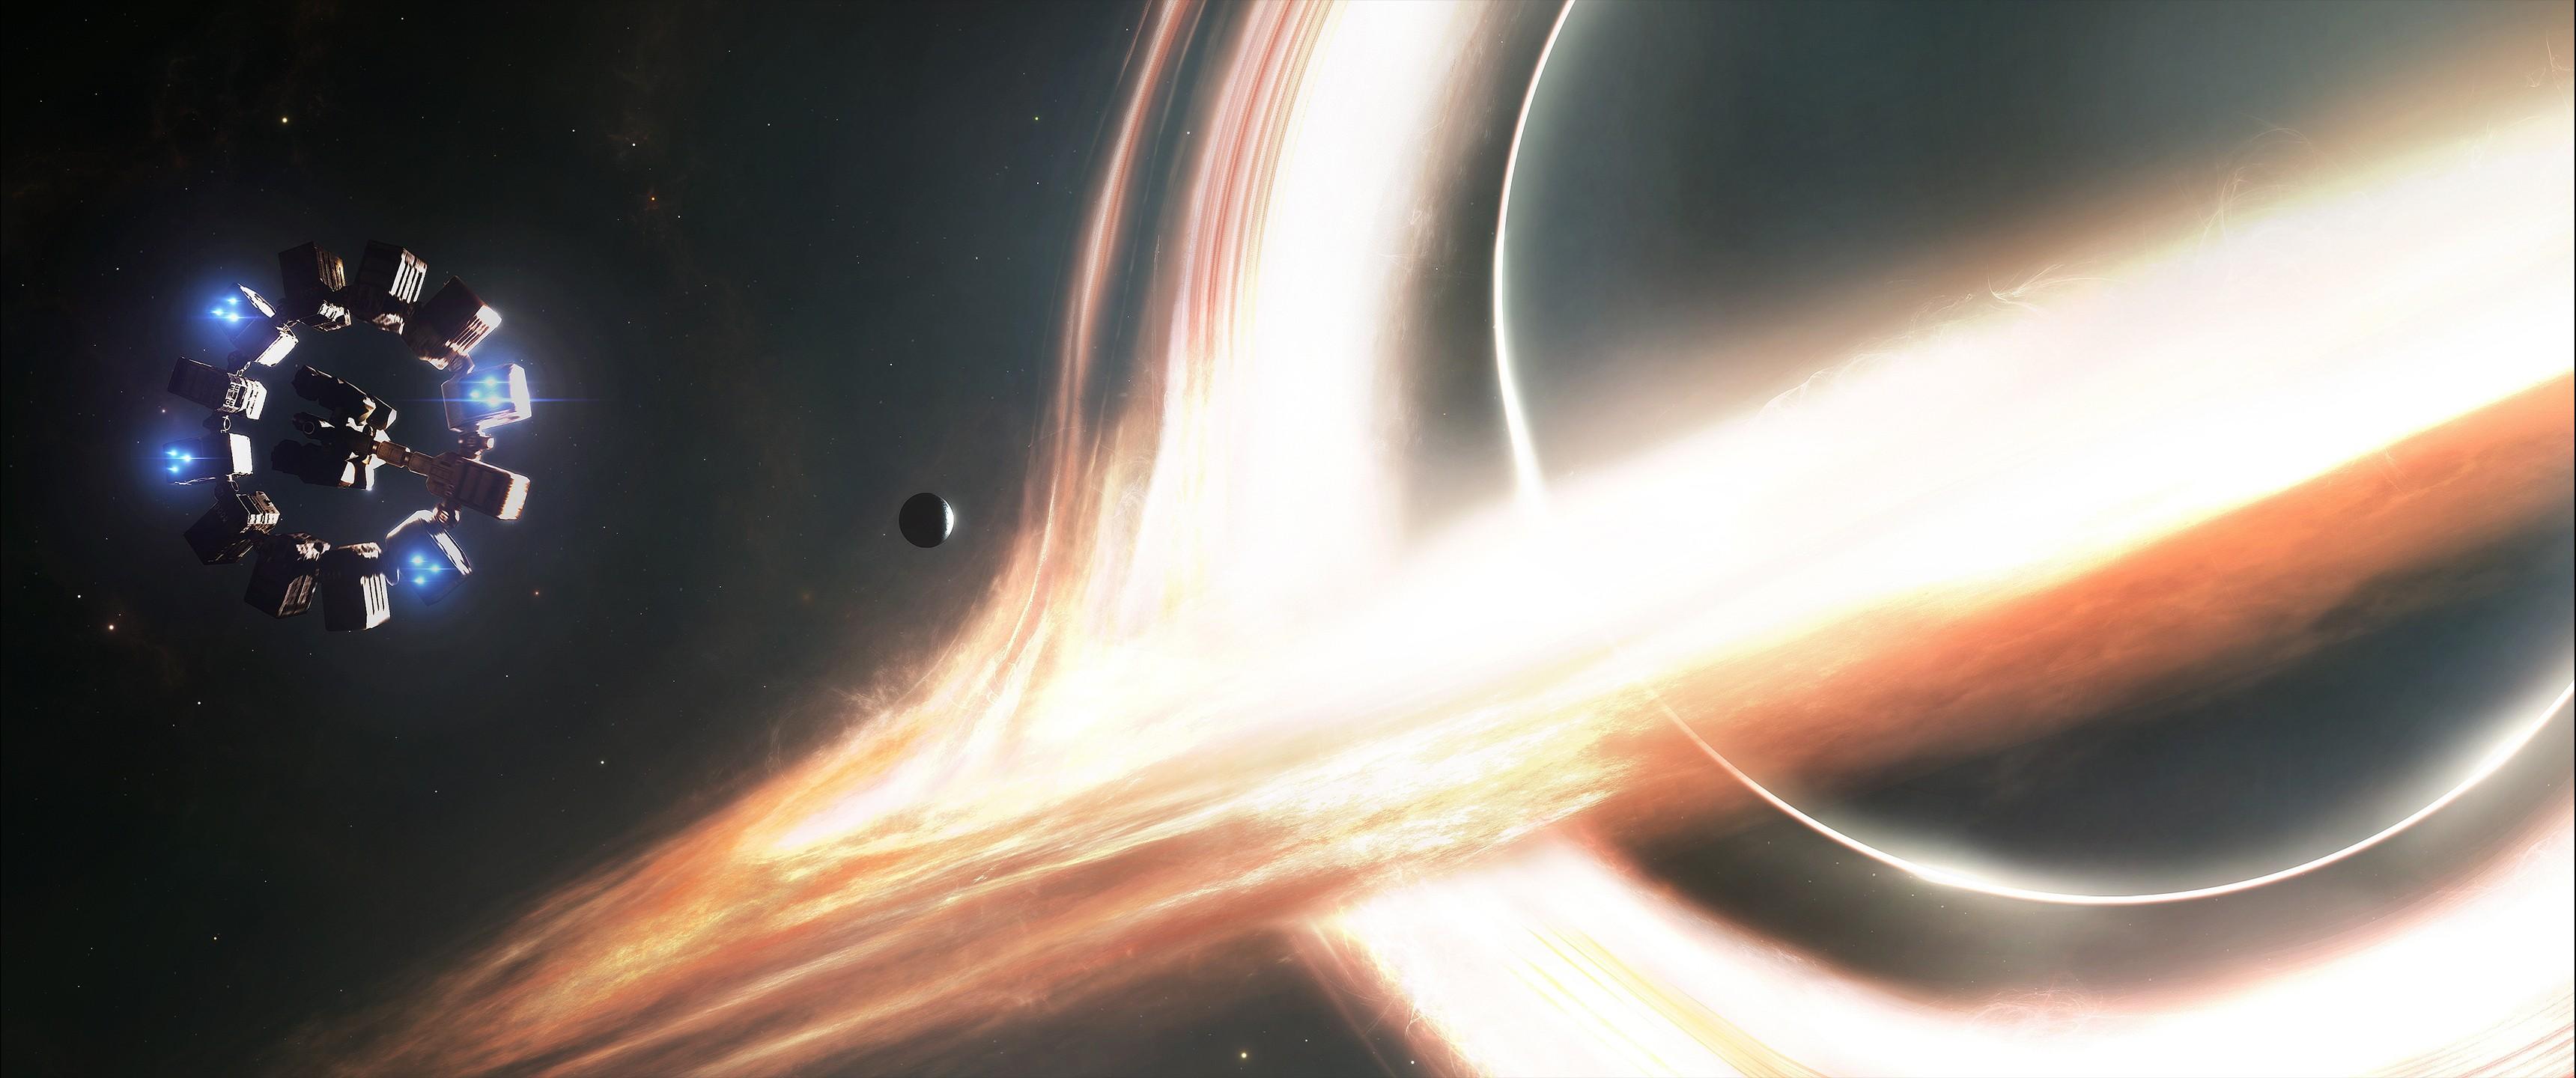 General 3440x1440 black holes Interstellar (movie) movies science fiction